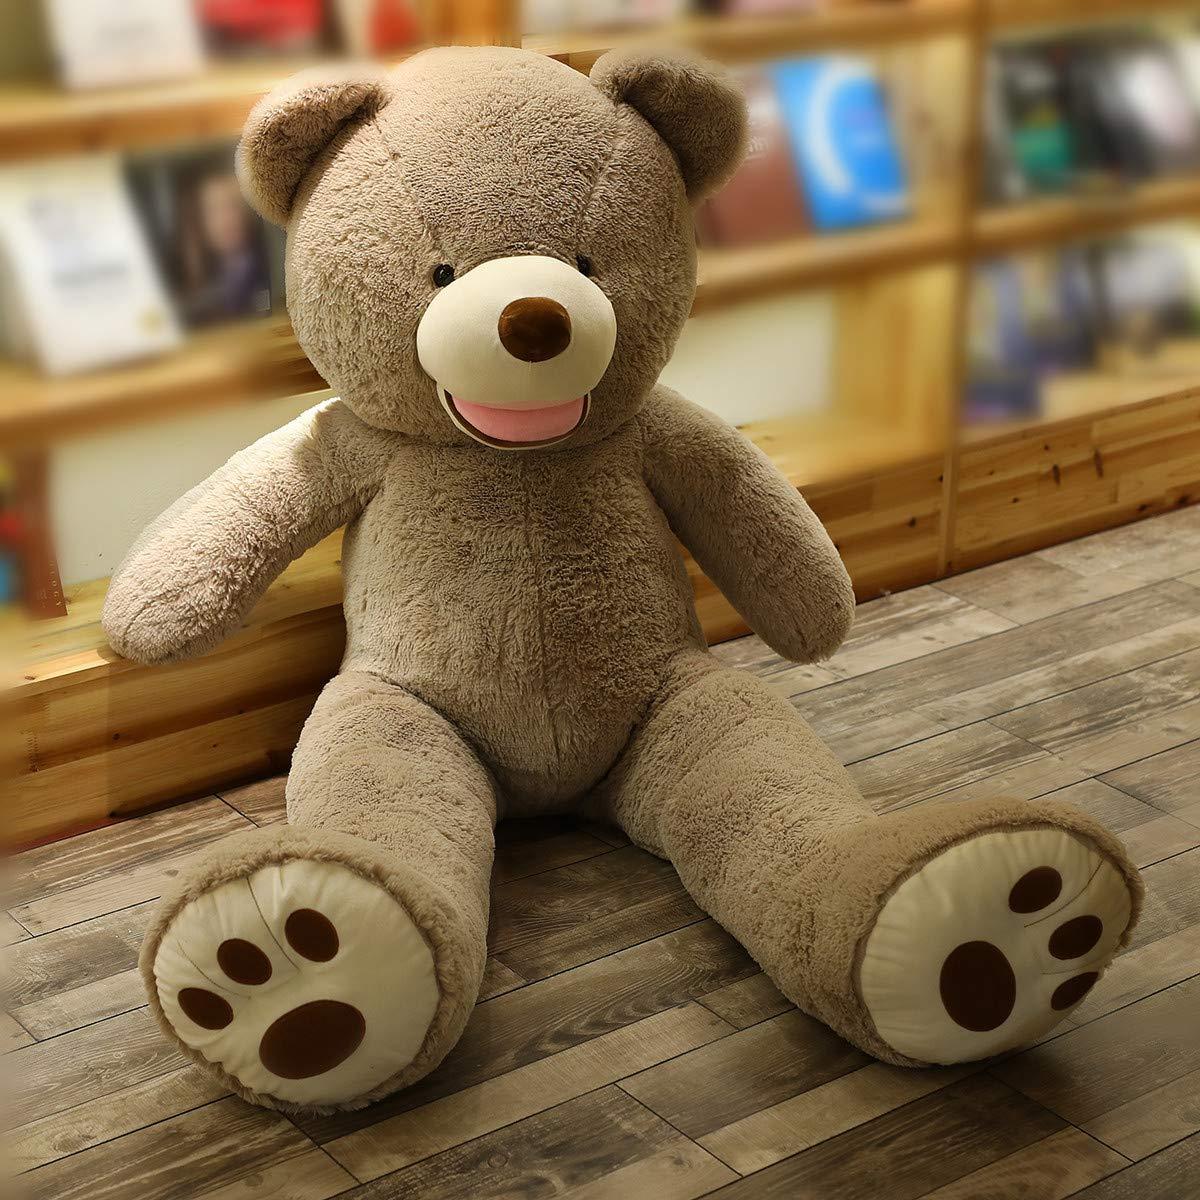 pink-39inch LApapaye Giant Teddy Bears Stuffed Animal Teddy Bear with Footprints Big Toys Life Size Plush Toy for Girlfriend